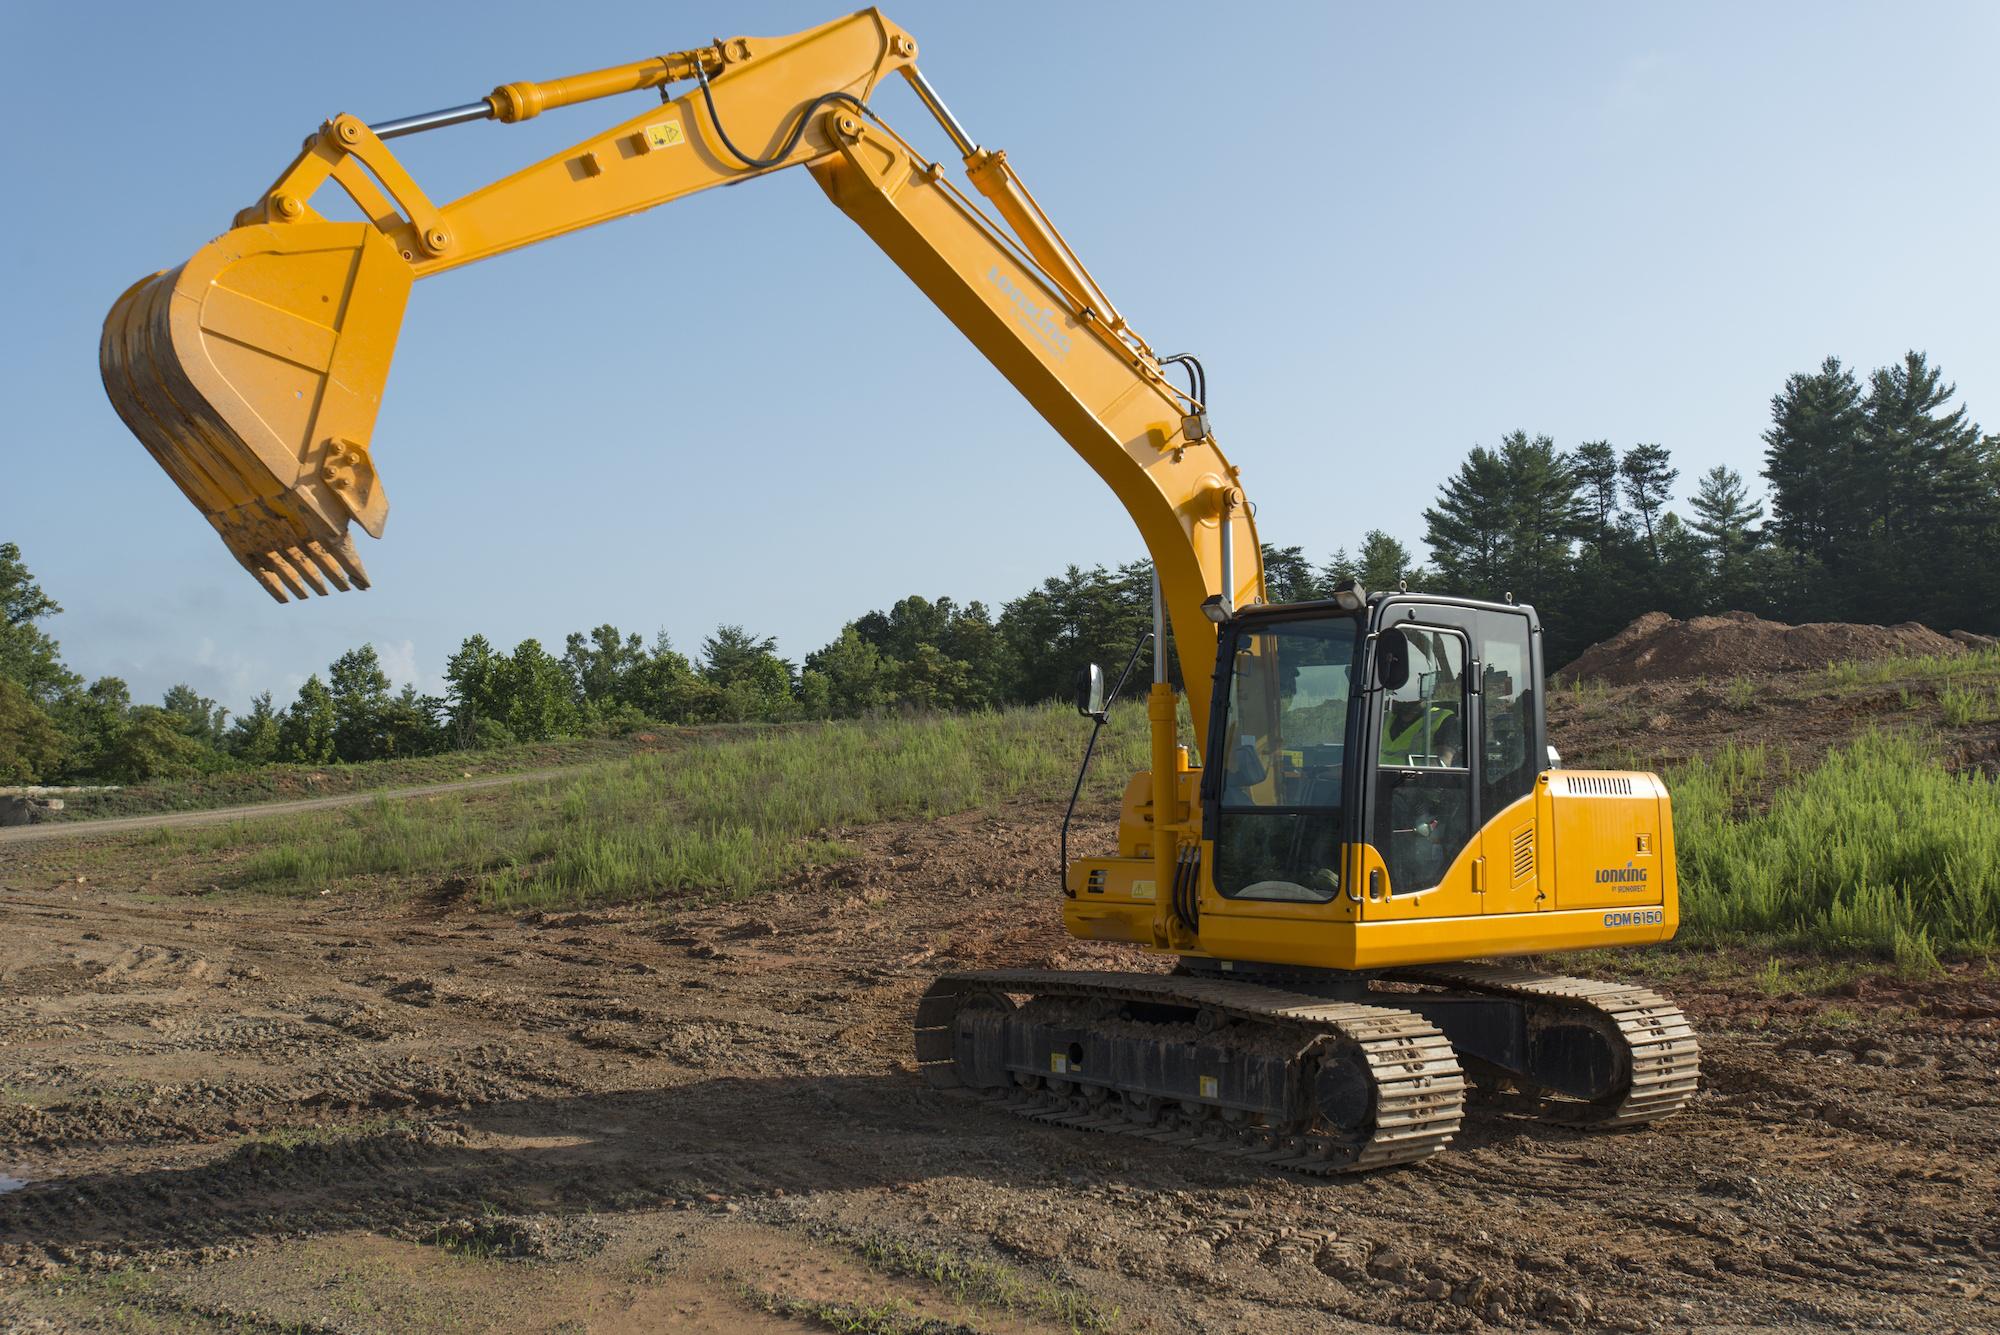 The Lonking CDM6150 excavator has a 121-horsepower Cummins QSB4.5 Tier 3  engine